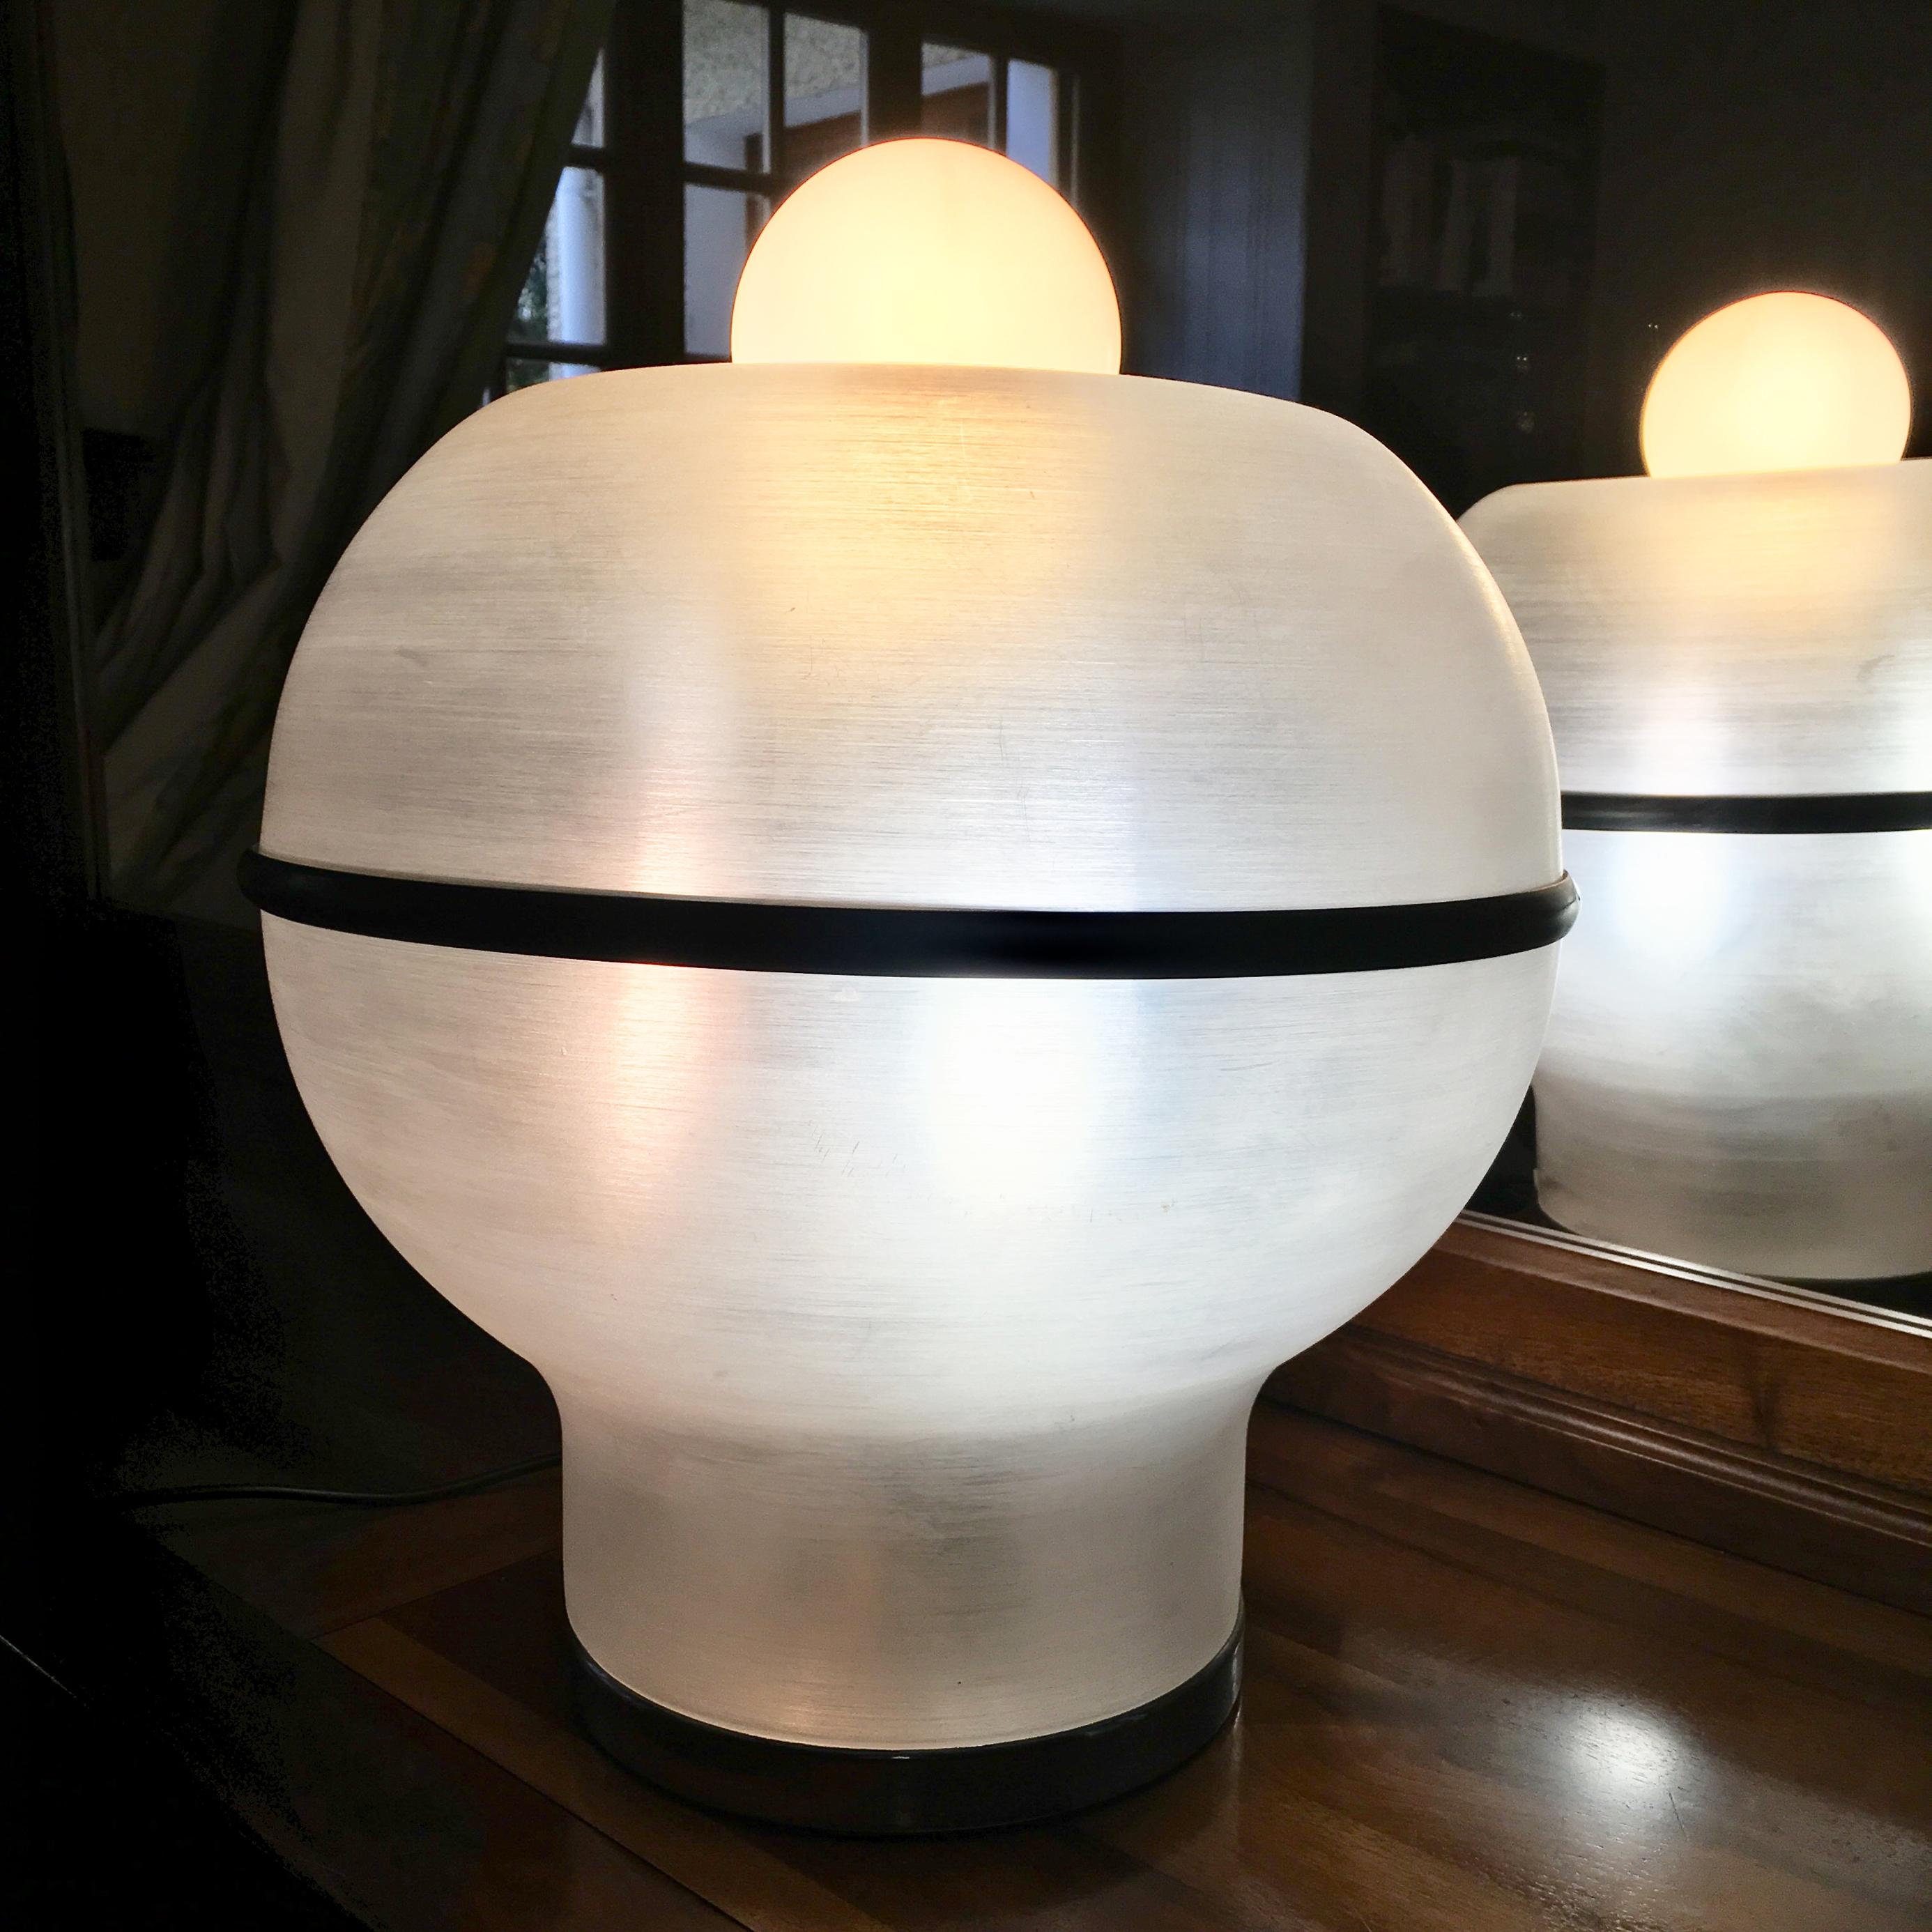 Age Guzzini 70 Harvey Années Lampe Sixties Space Magic N0nvmw8